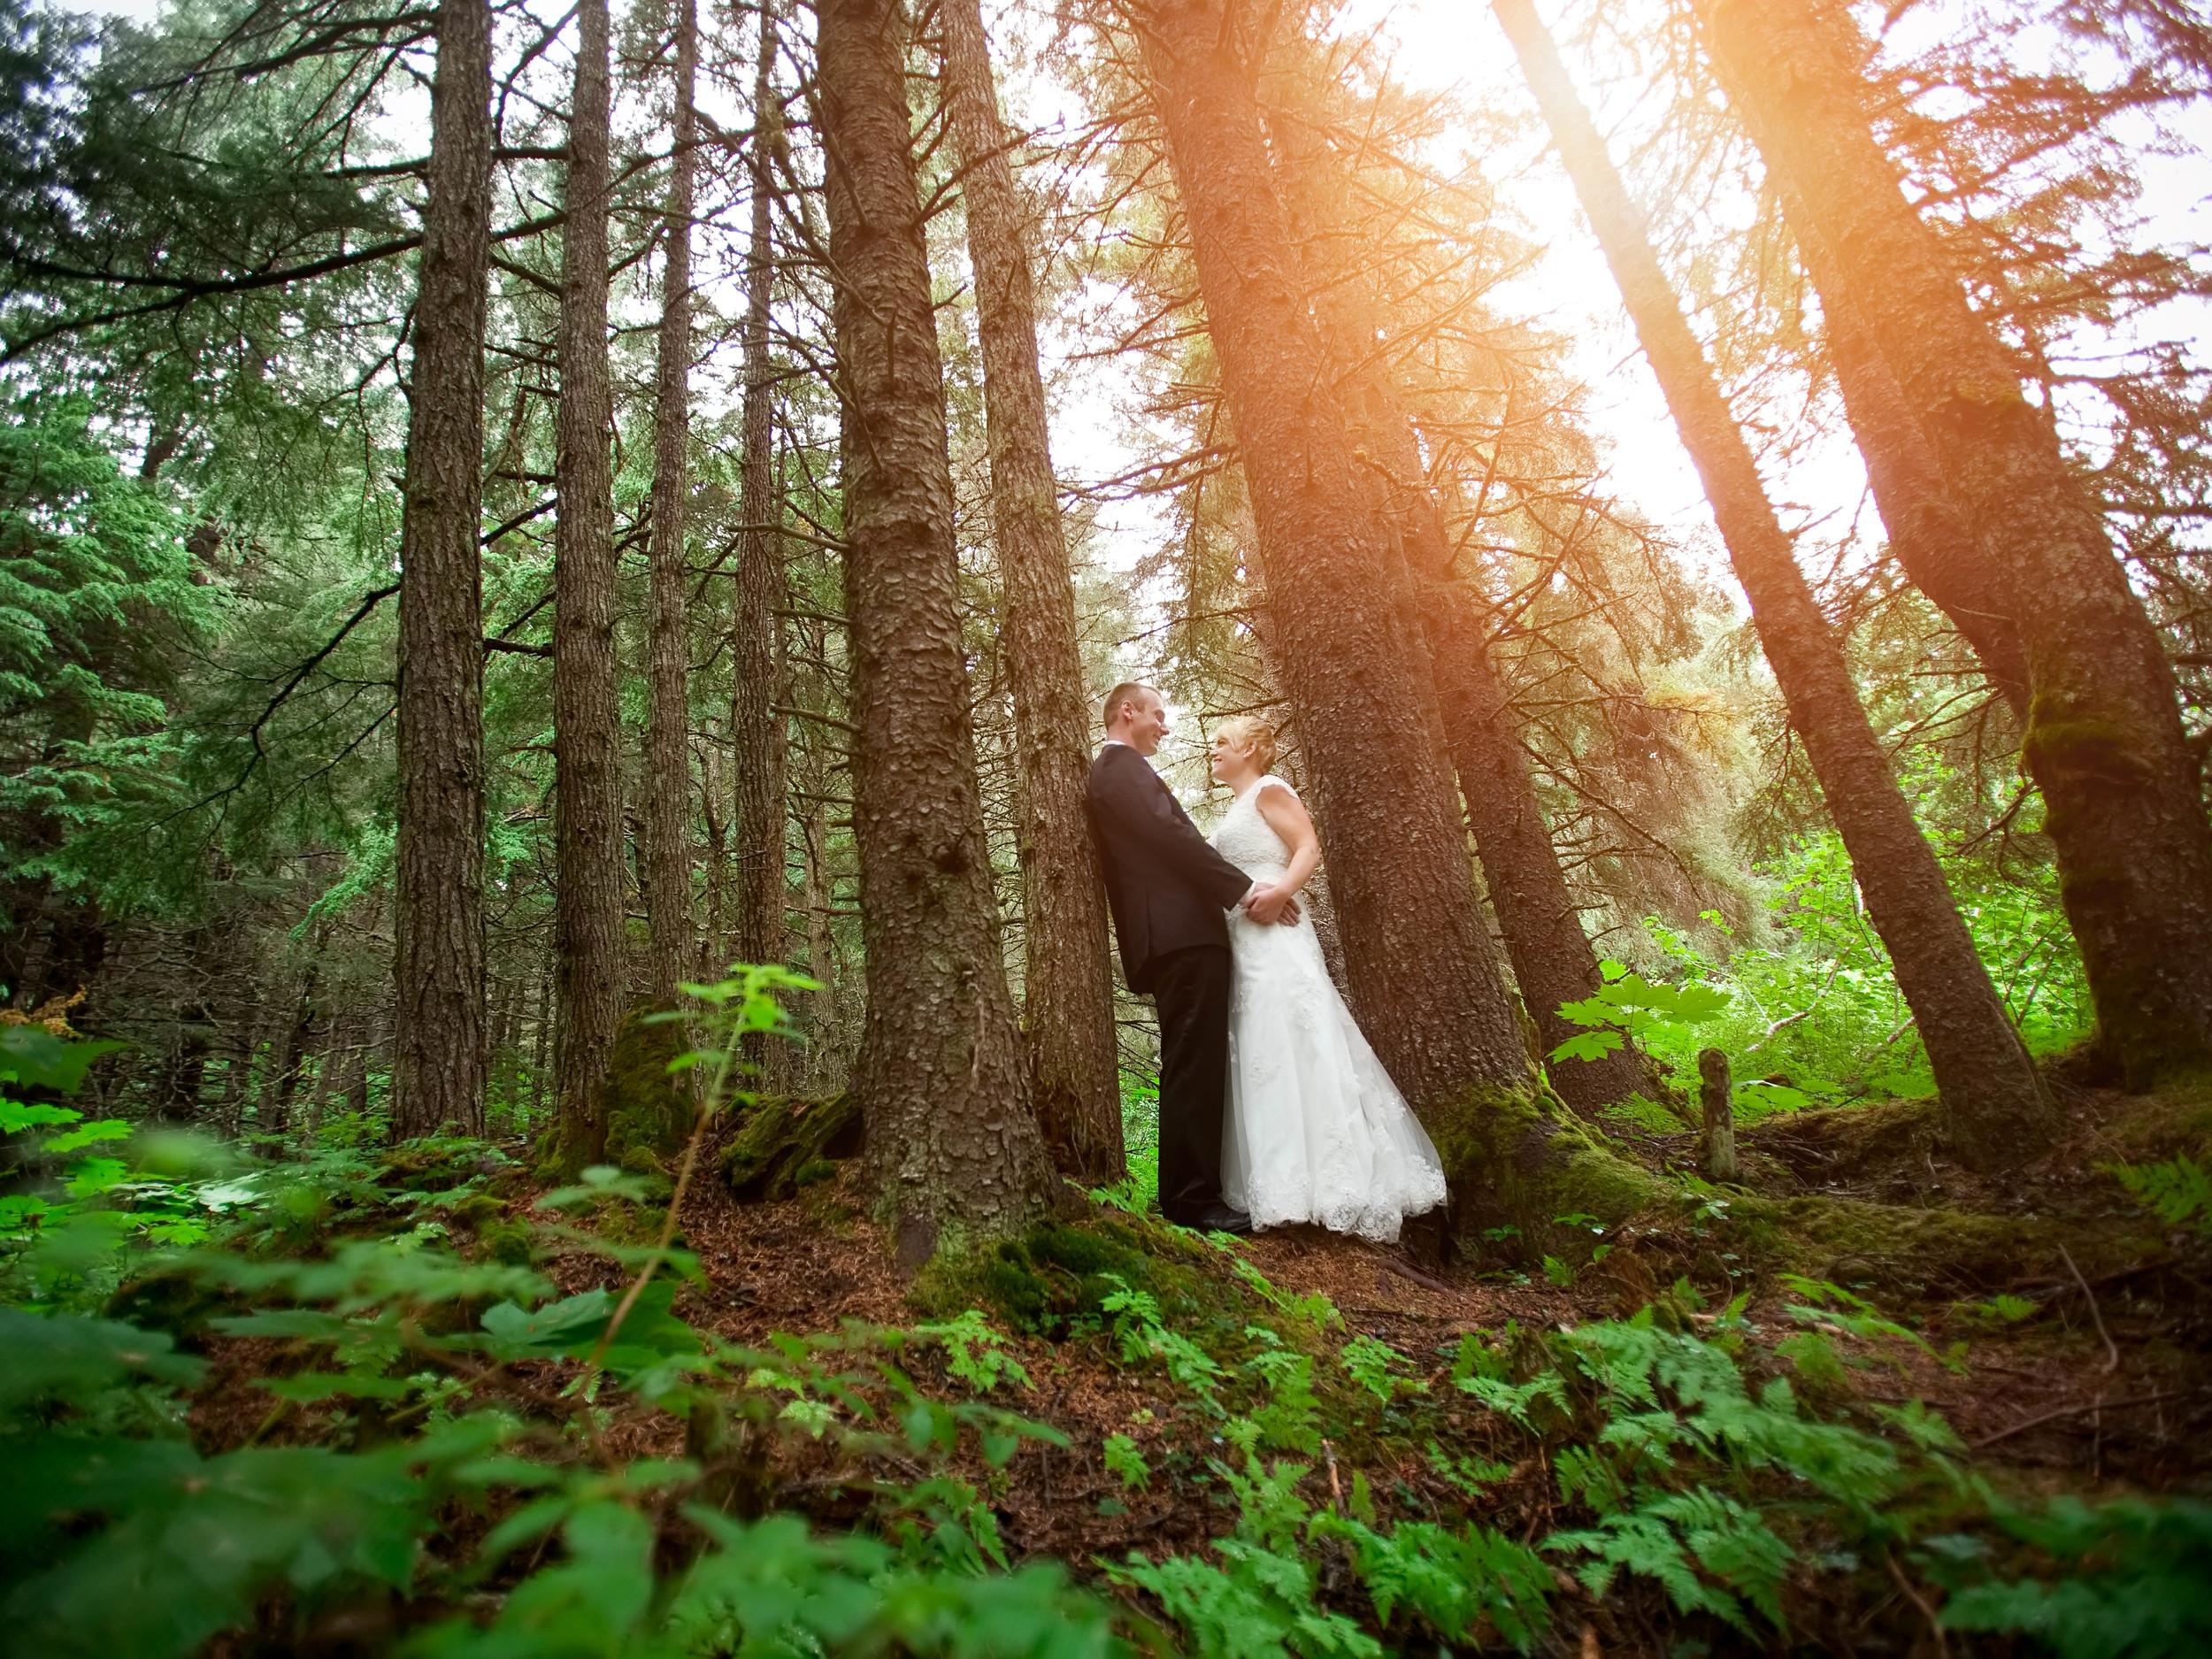 tg-wedding-photogrpahy-12.jpg